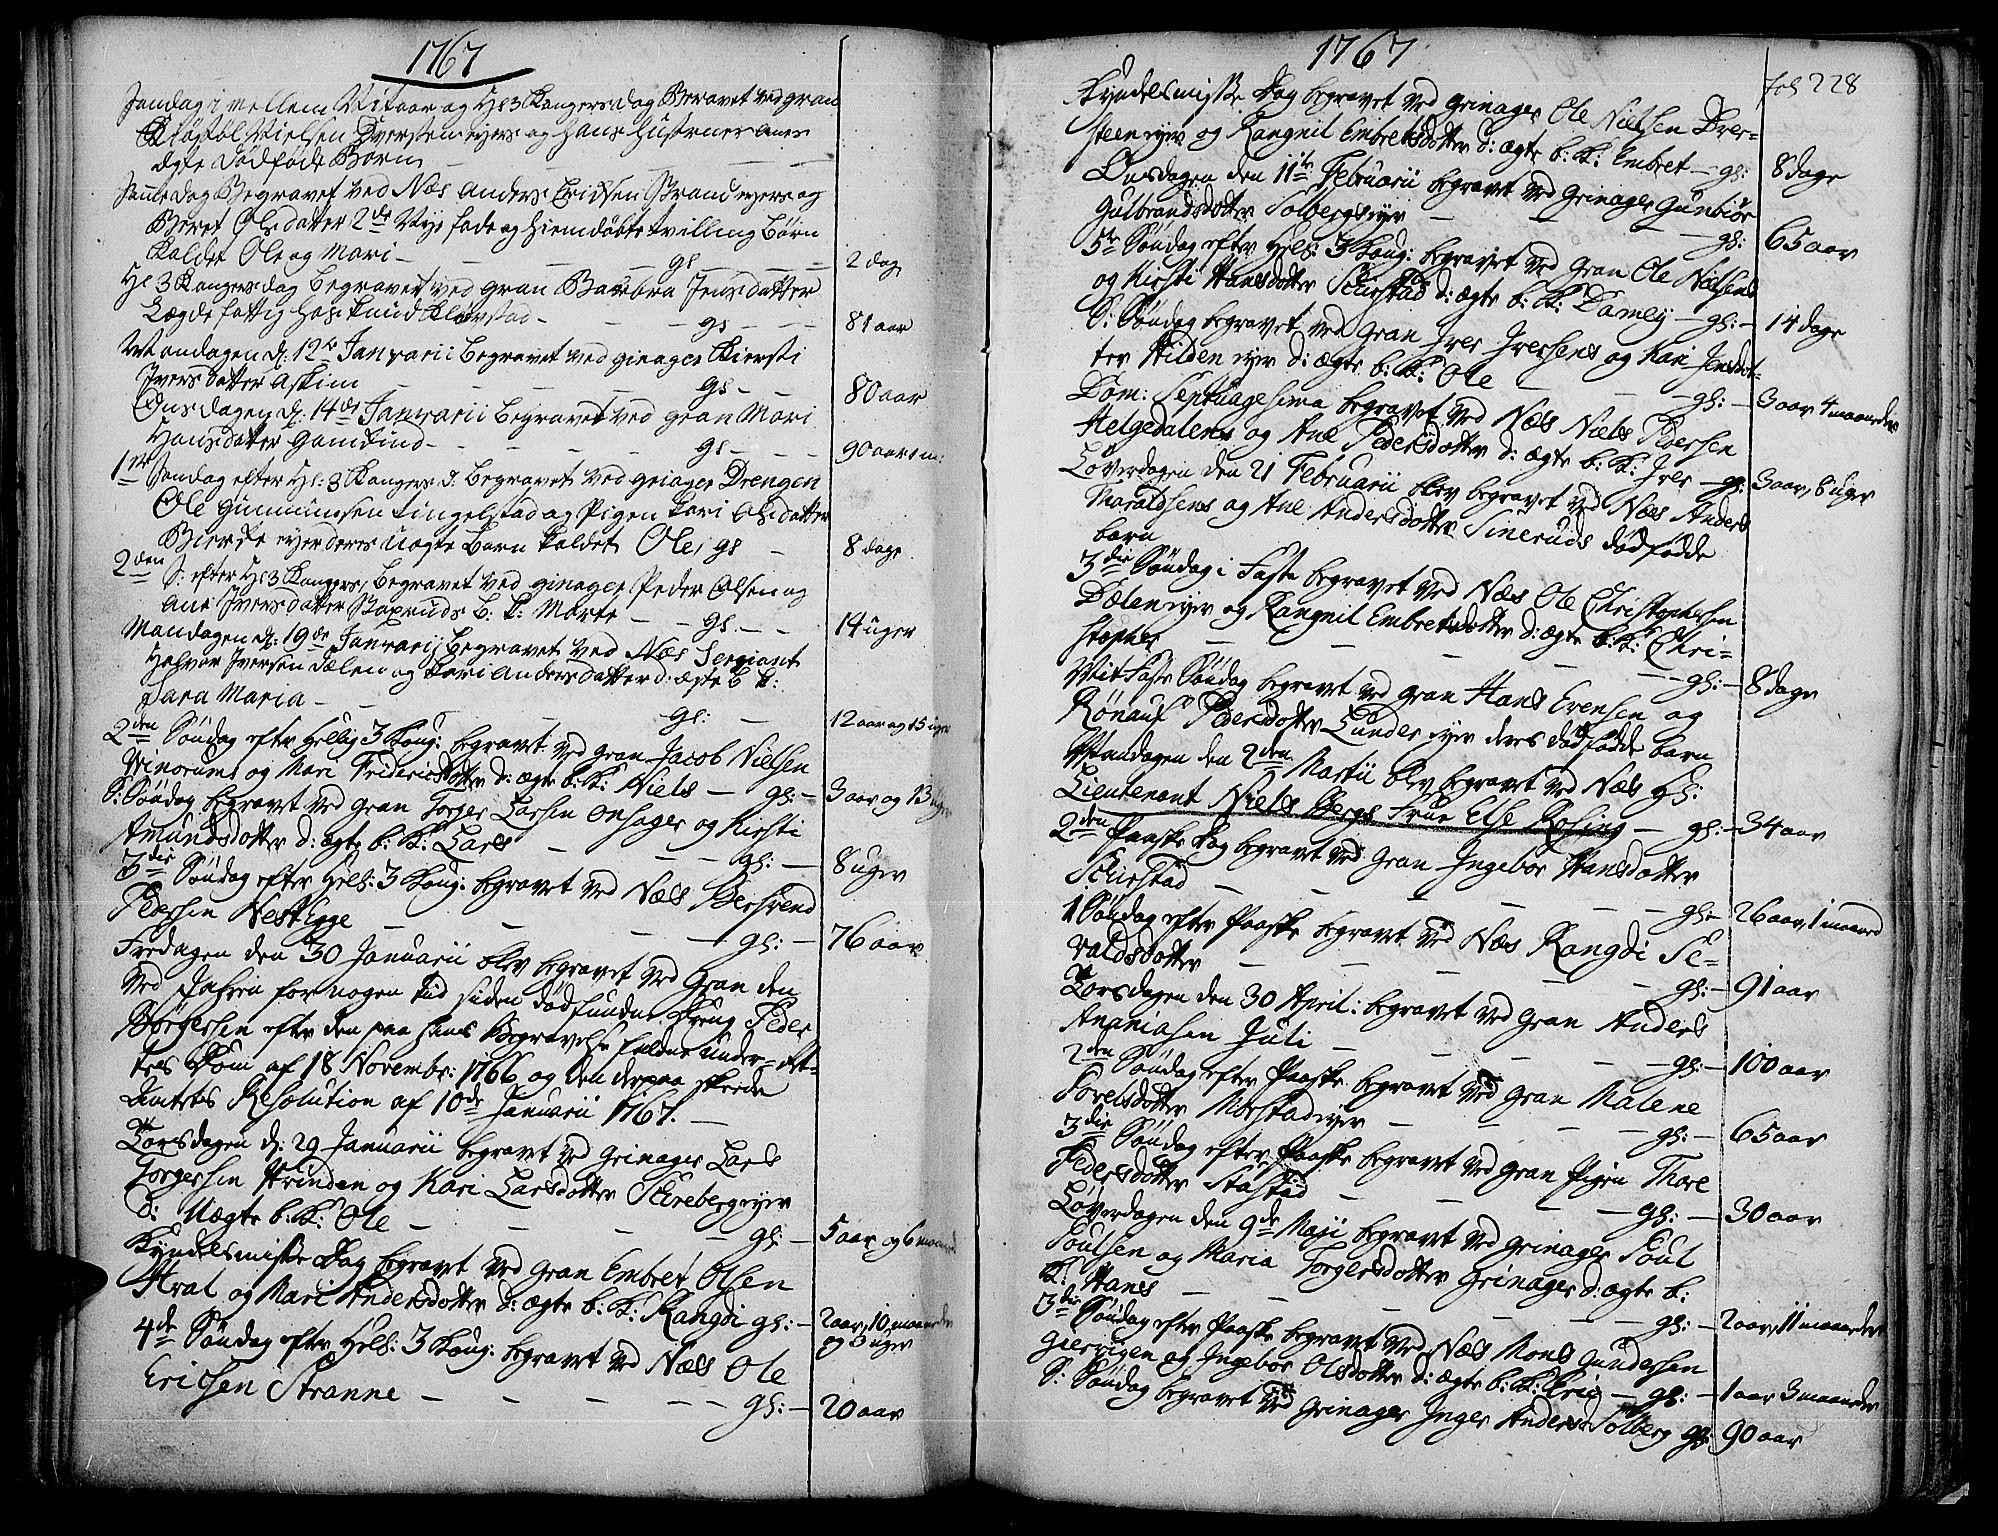 SAH, Gran prestekontor, Ministerialbok nr. 4, 1759-1775, s. 228